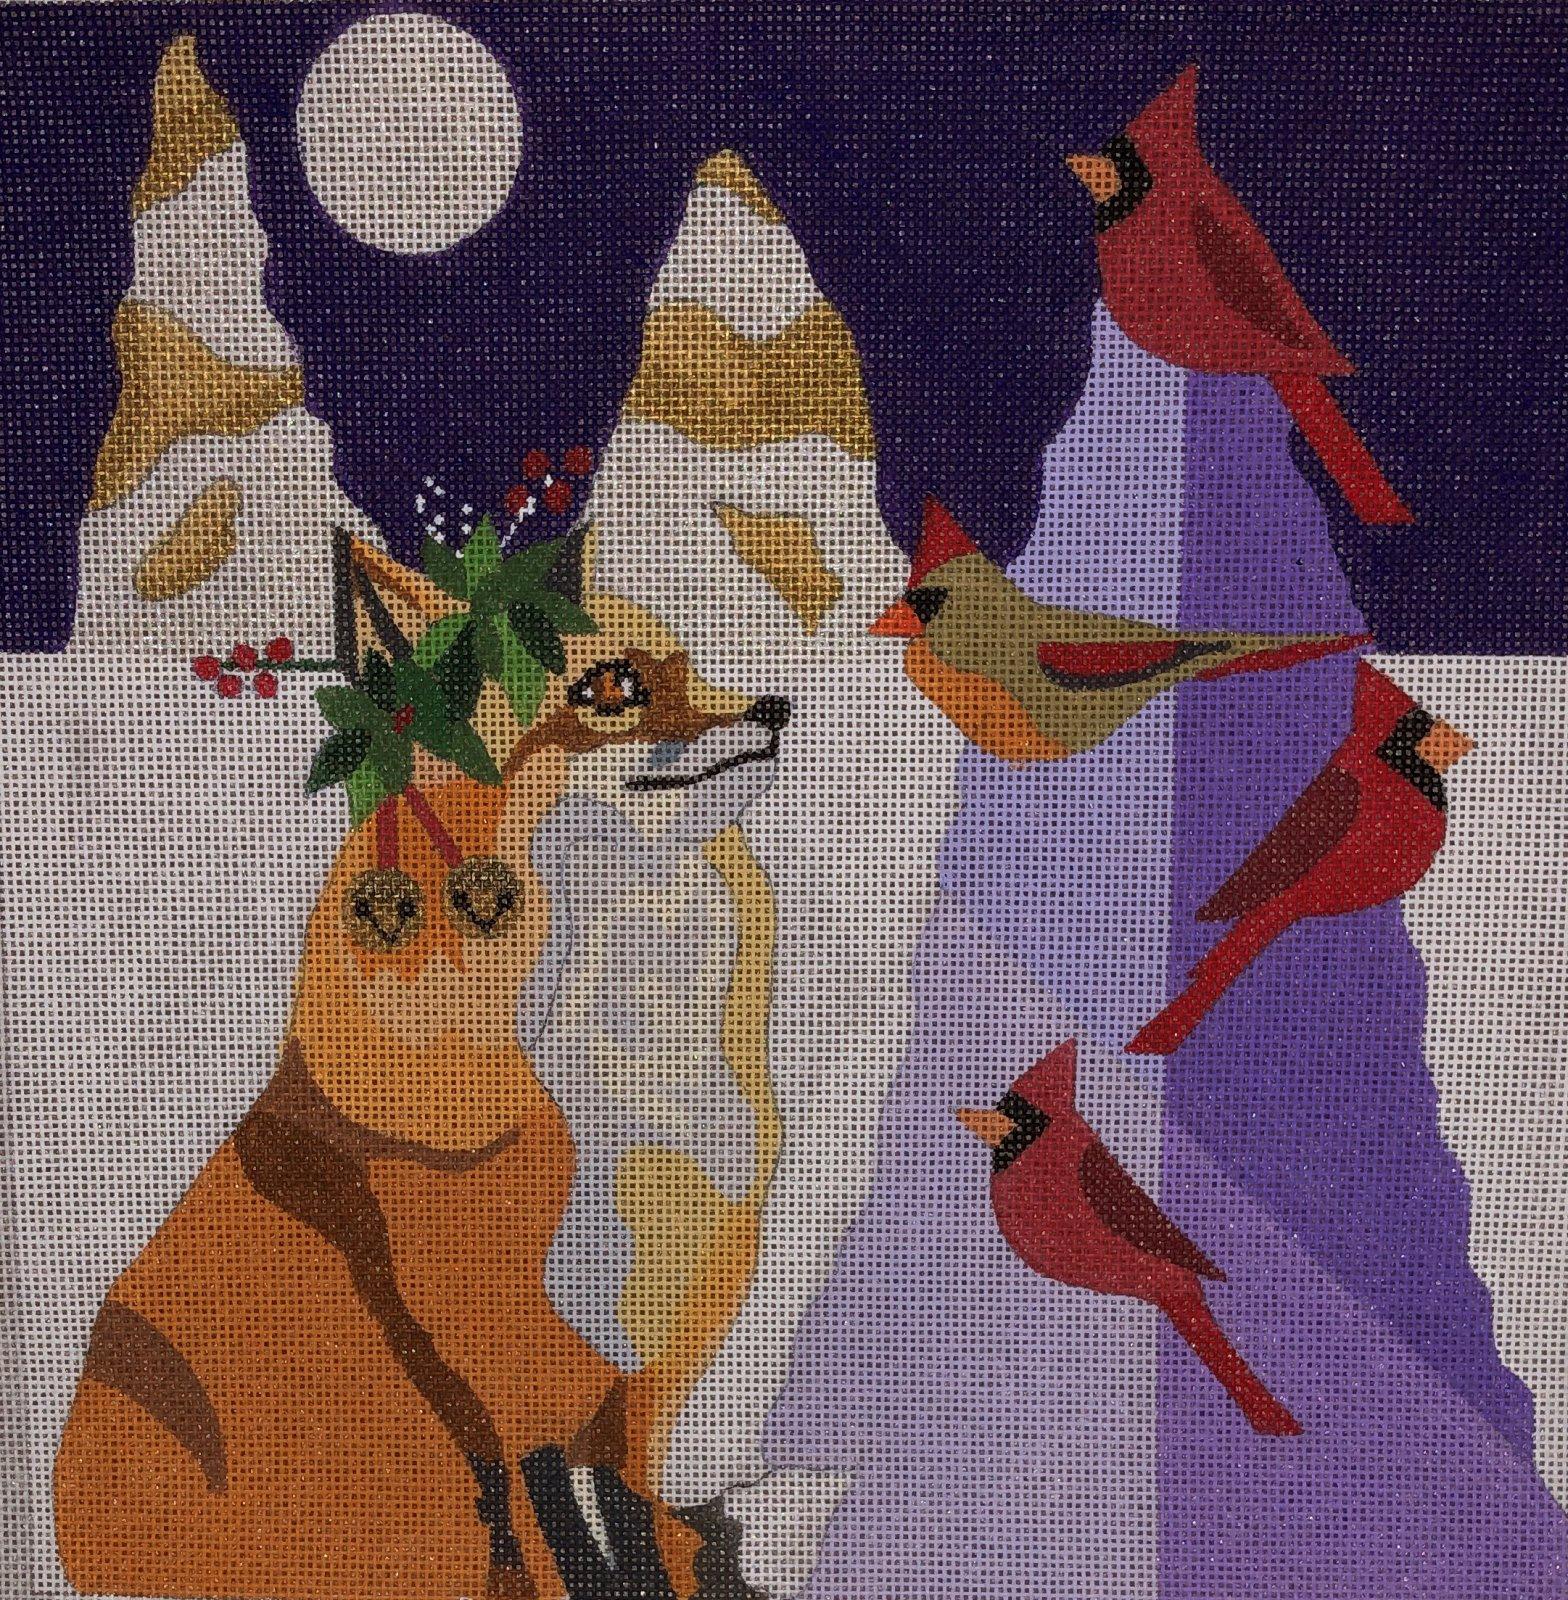 H263 - FOX & CARDINALS